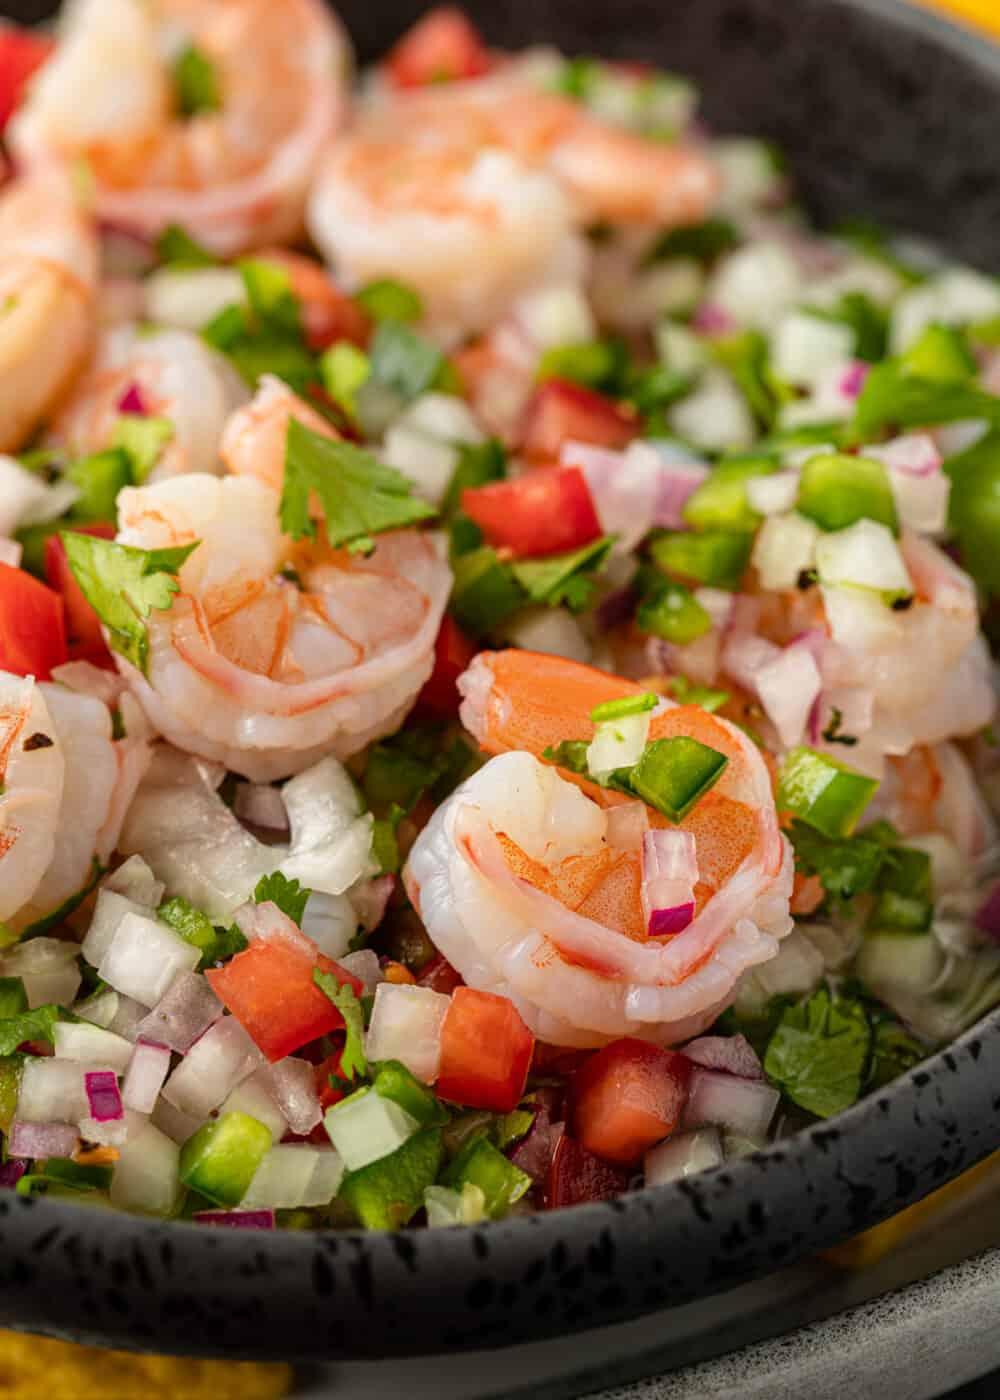 fresh shrimp appetizer in bowl with pico de gallo